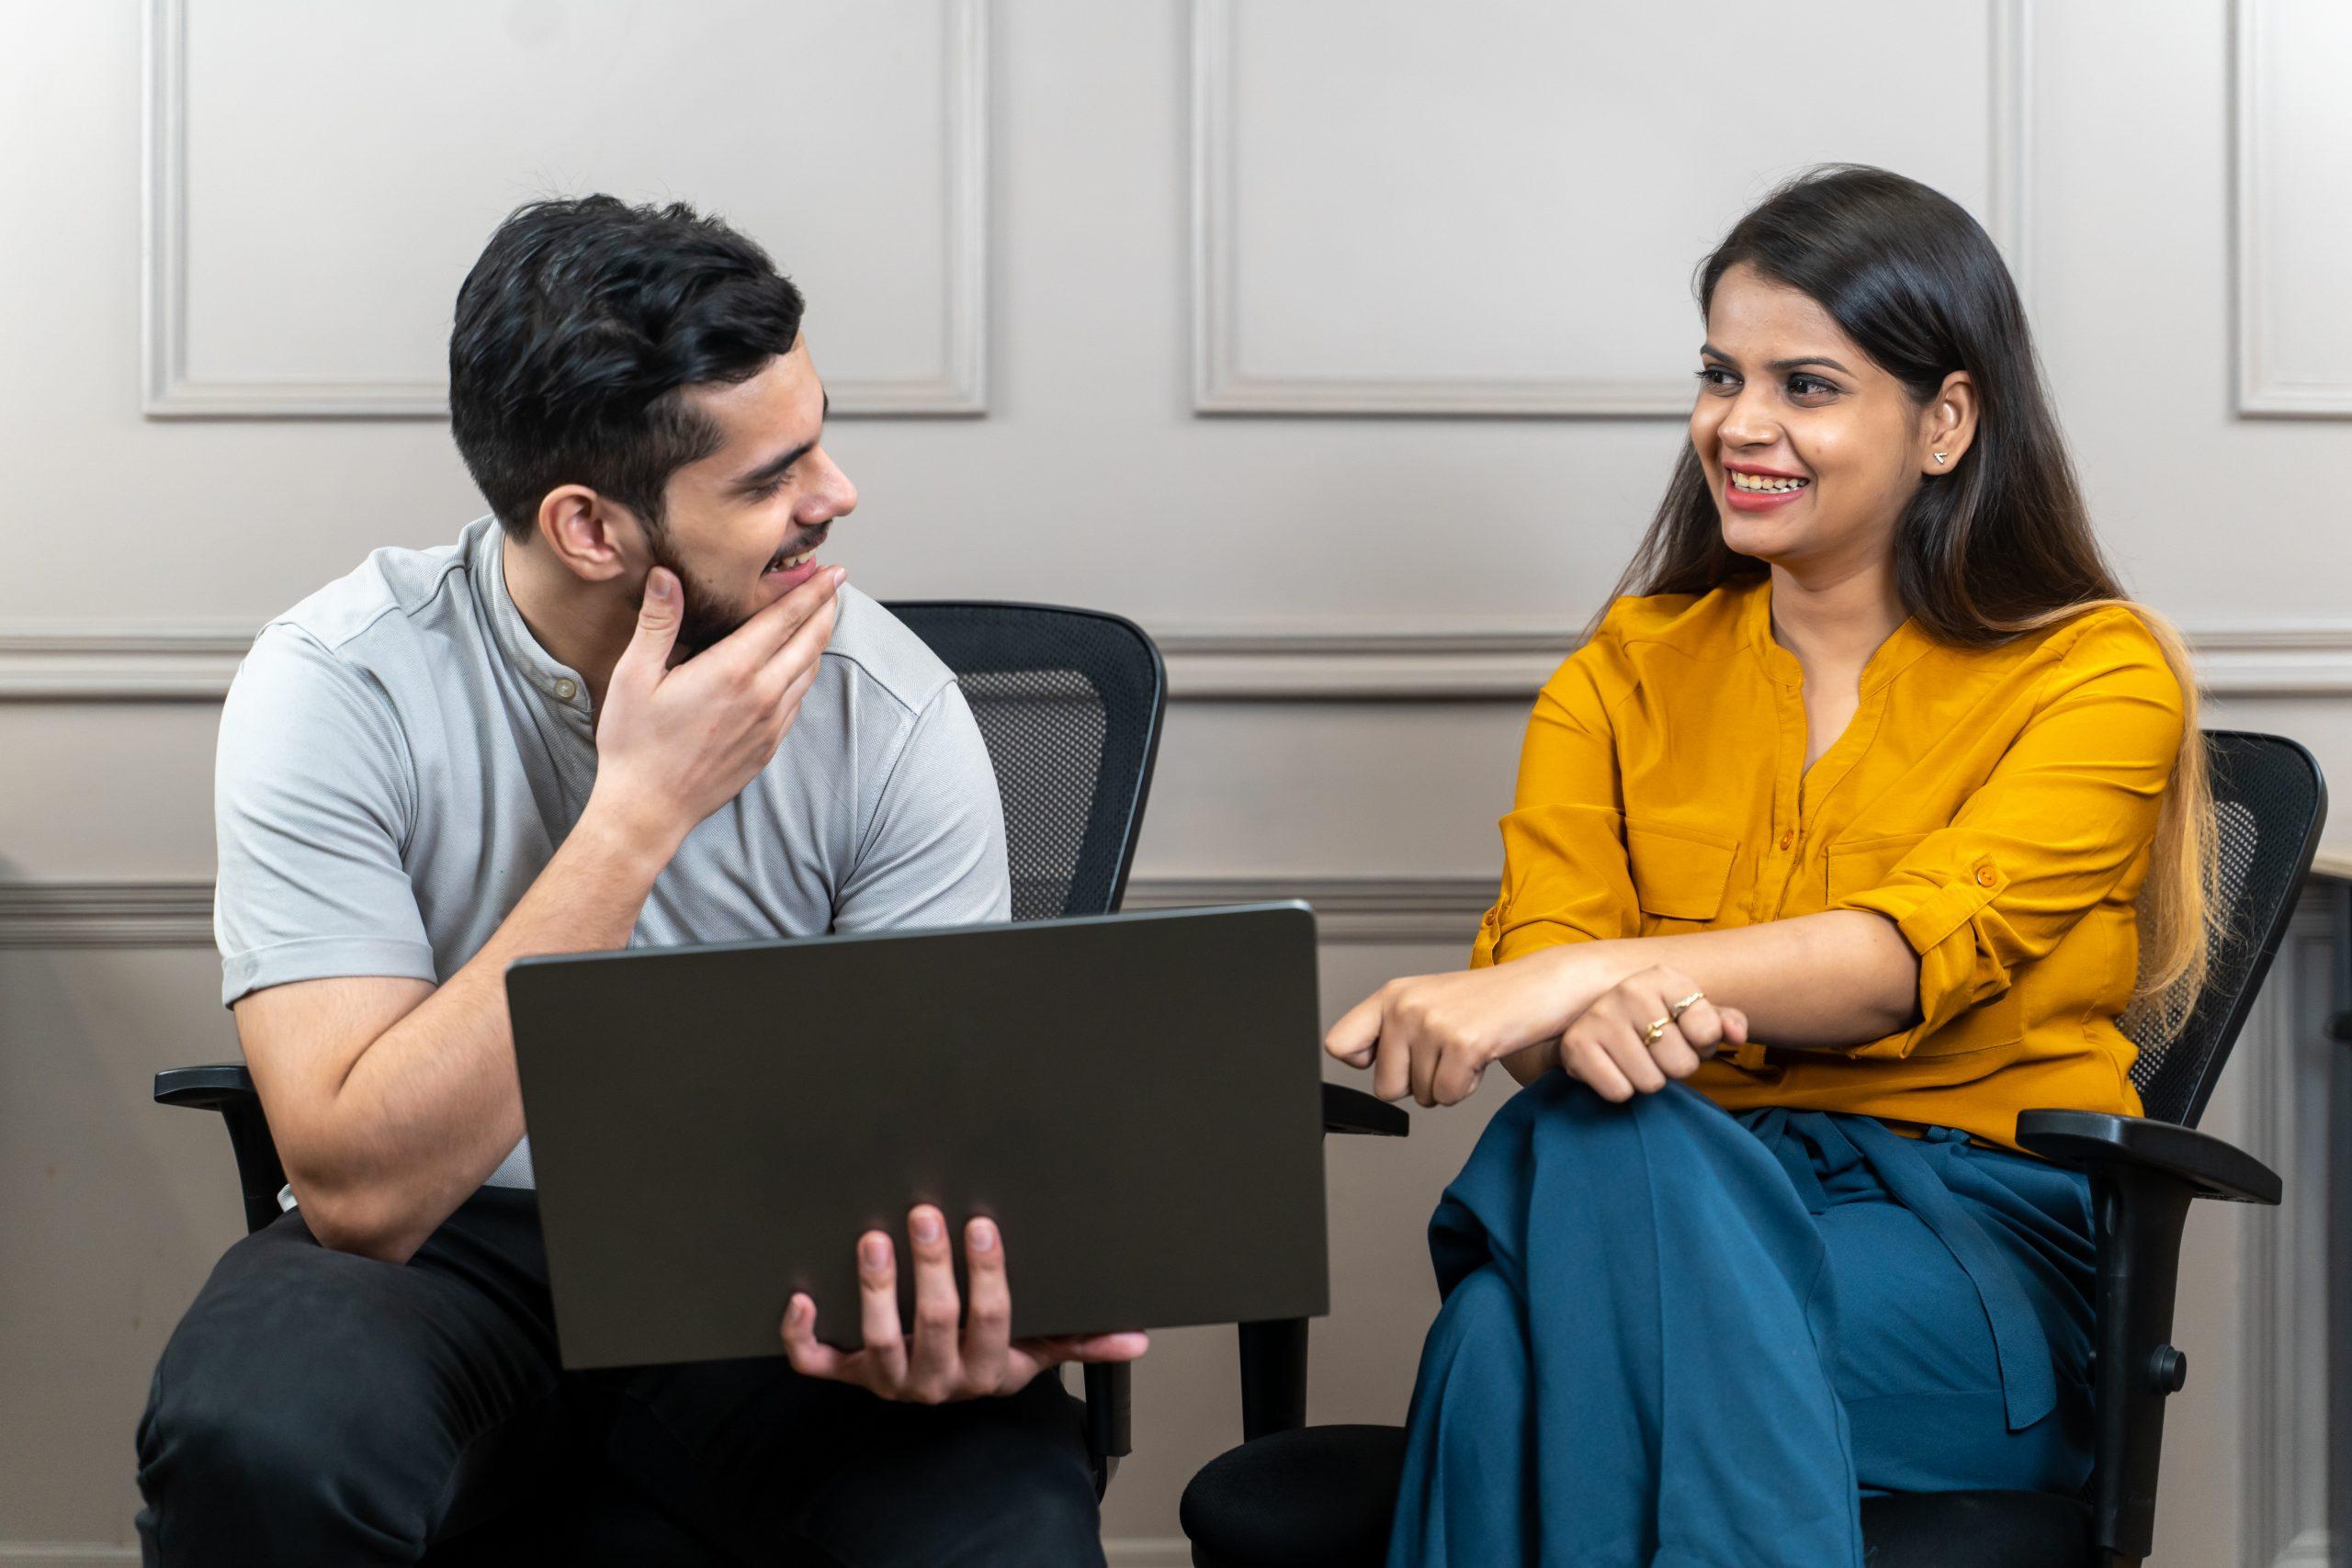 Office employees gossiping